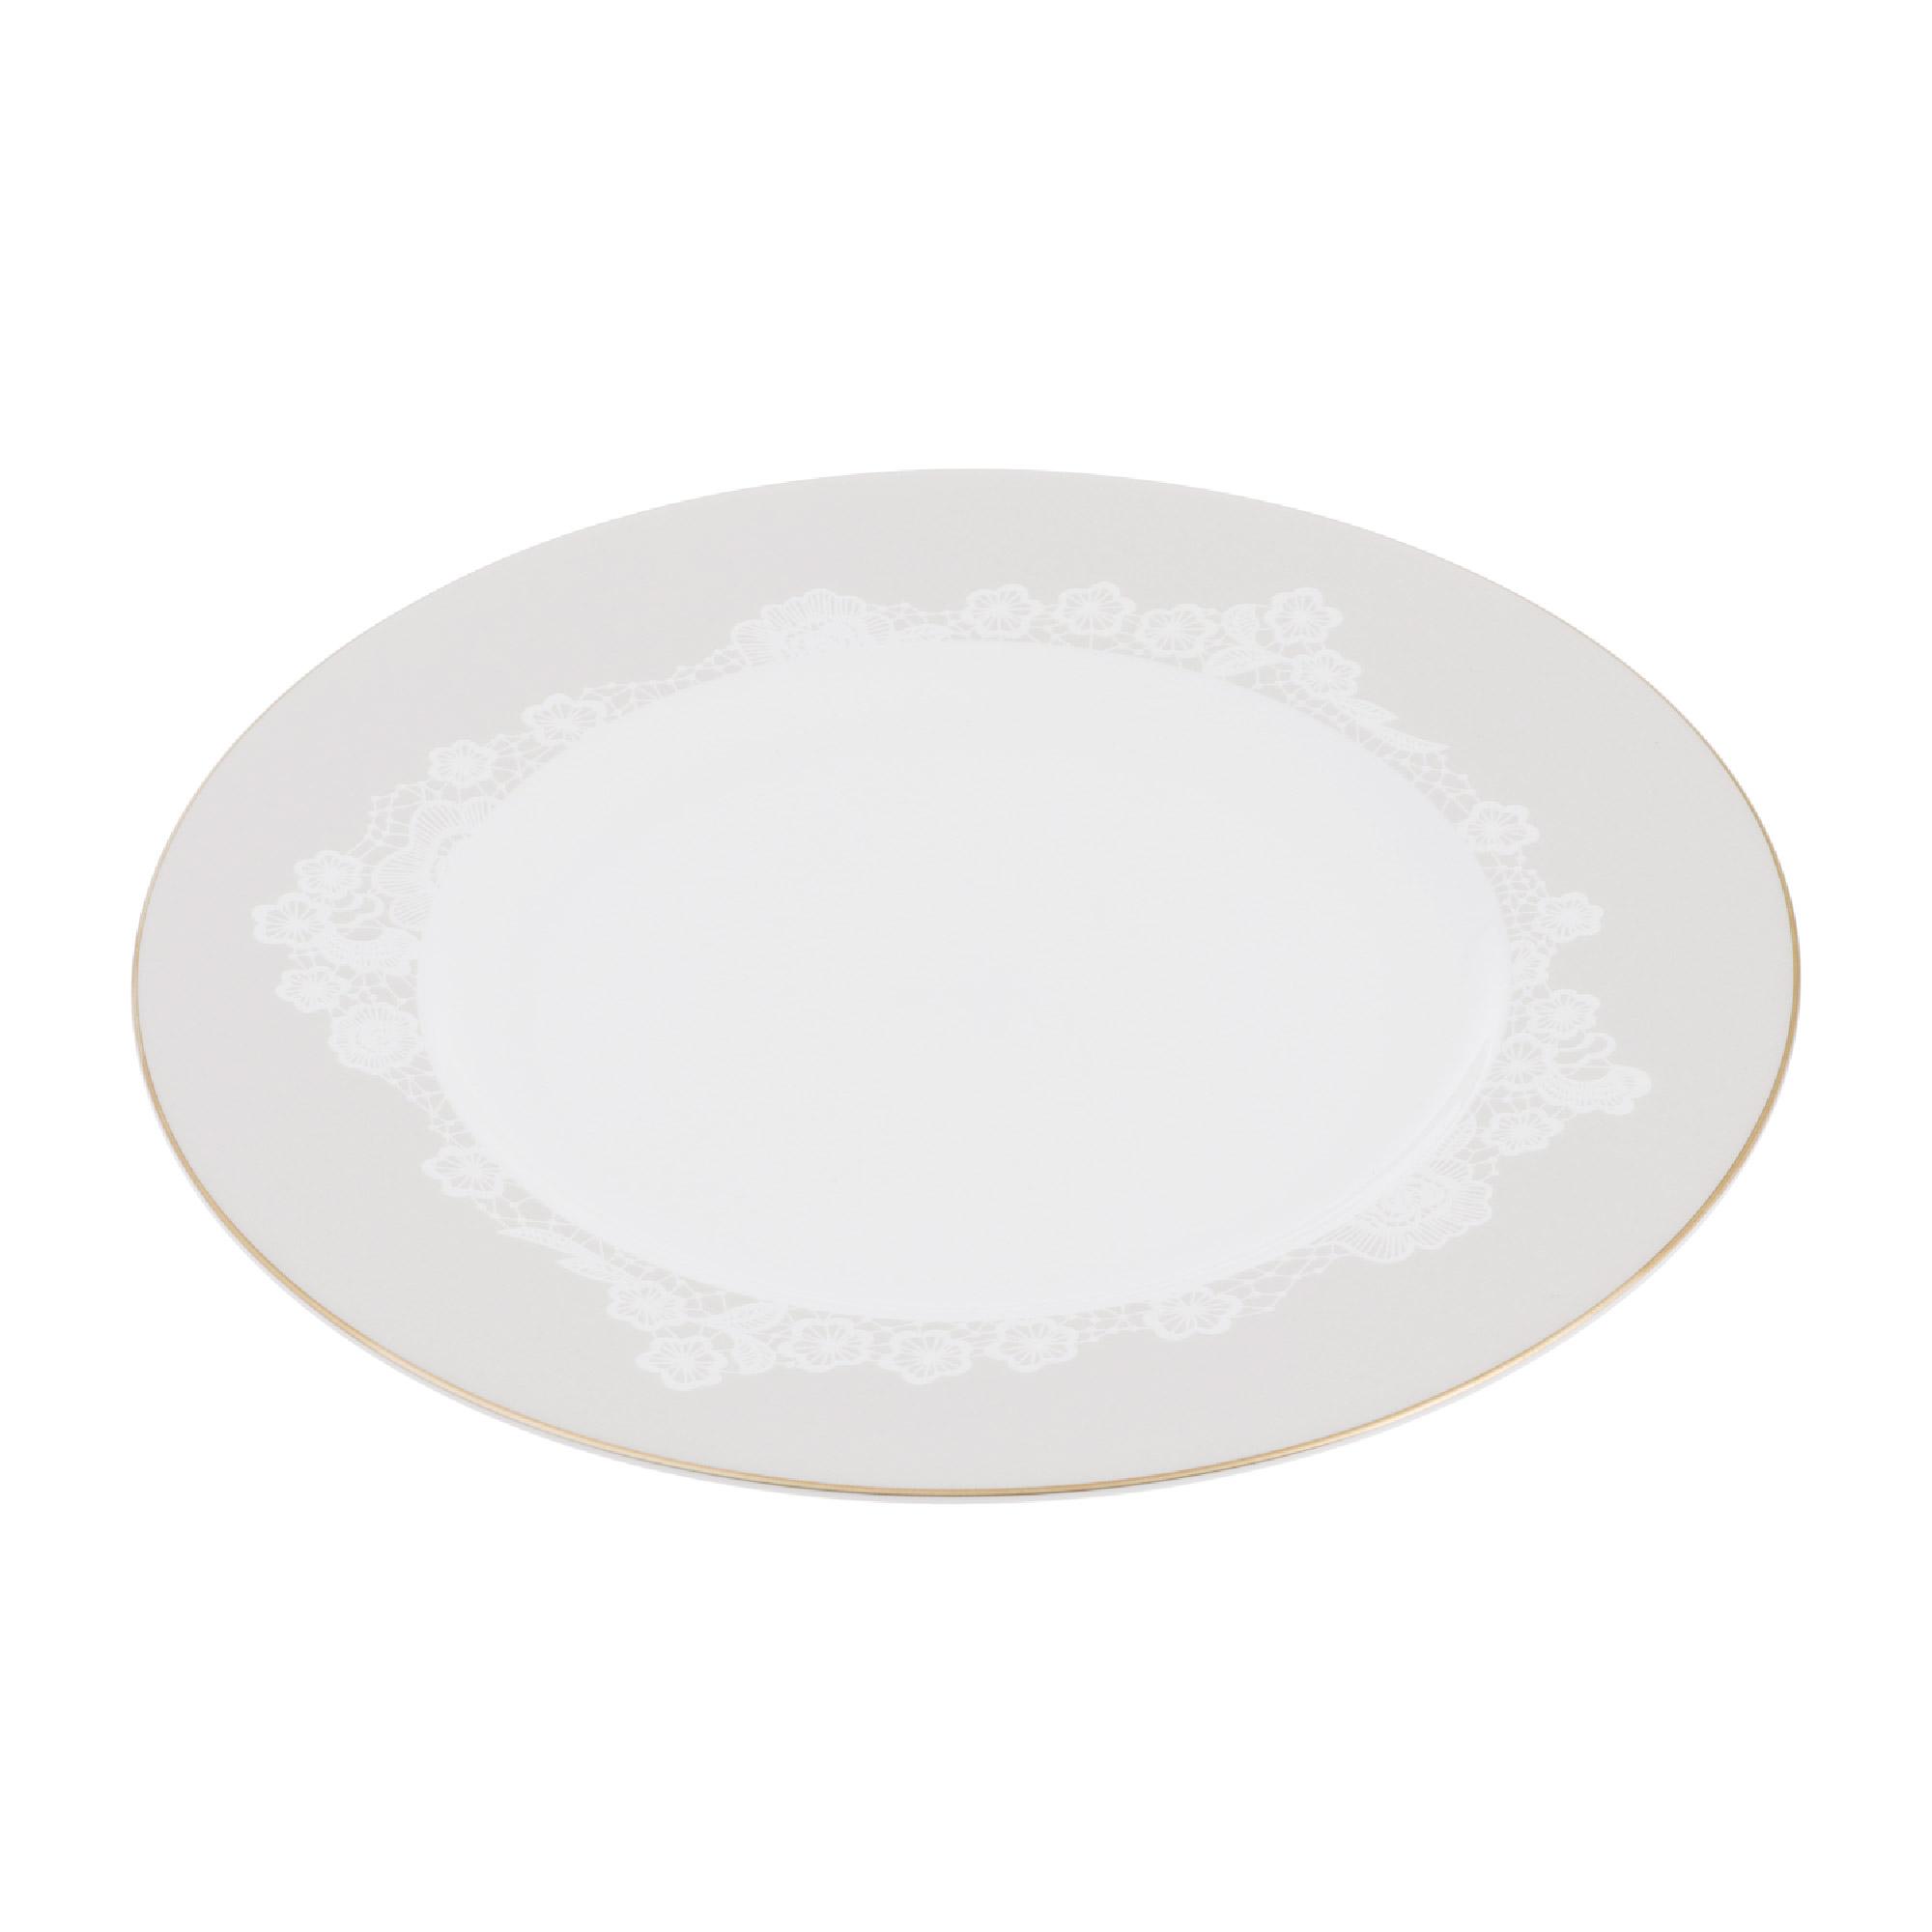 Фото - Набор тарелок Hankook/Prouna Веддинг Империал 27 см 6 шт набор суповых тарелок hankook prouna эпл би 23 см 6 шт